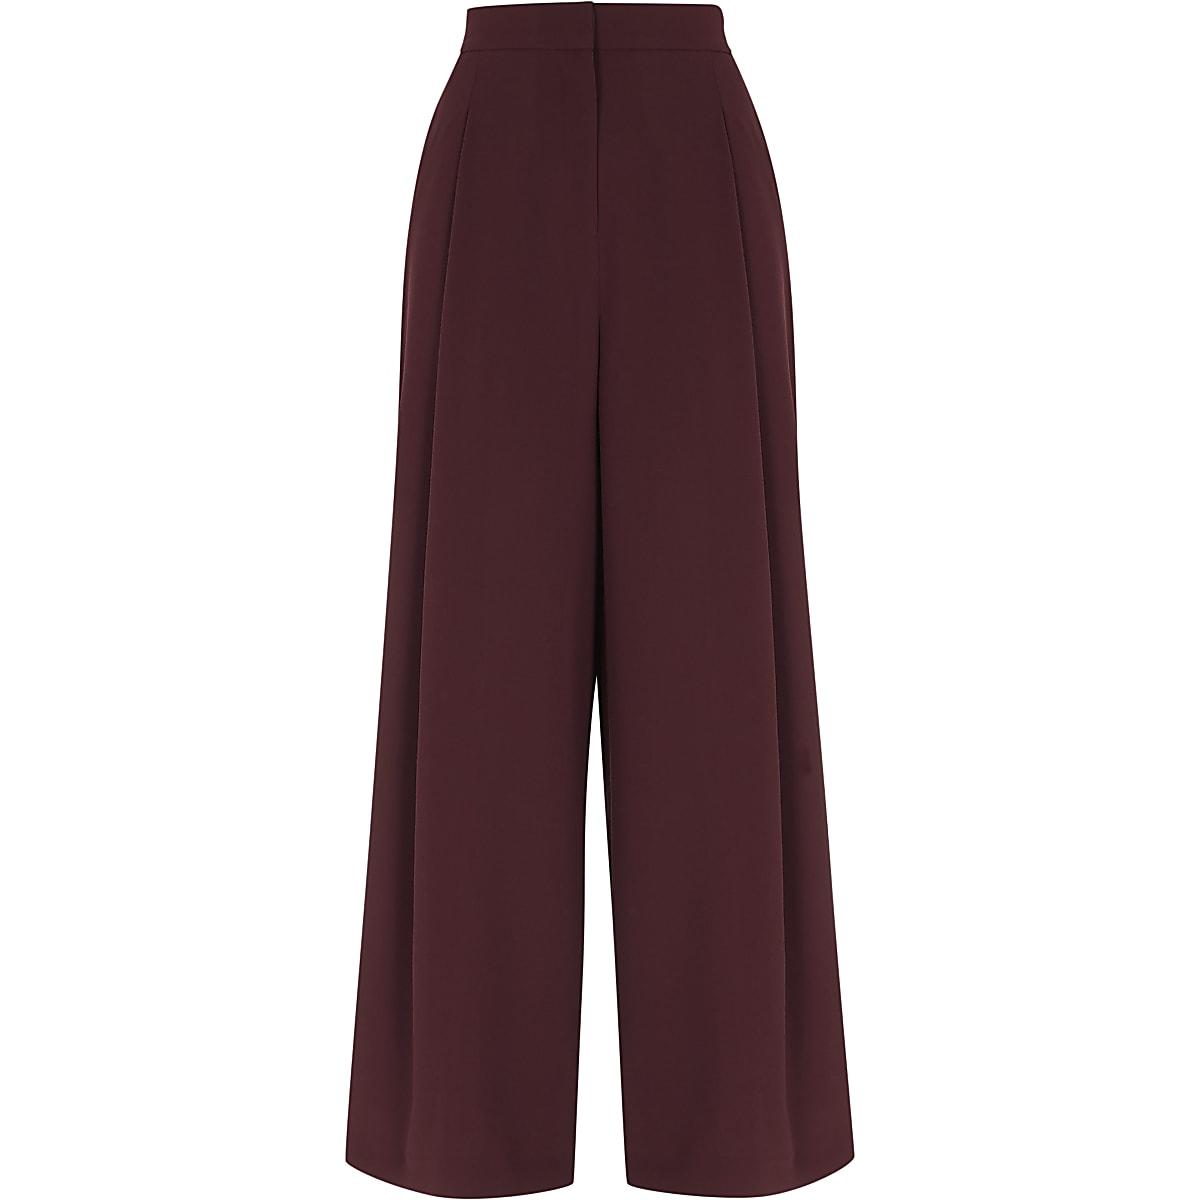 Burgundy side stripe wide leg pants